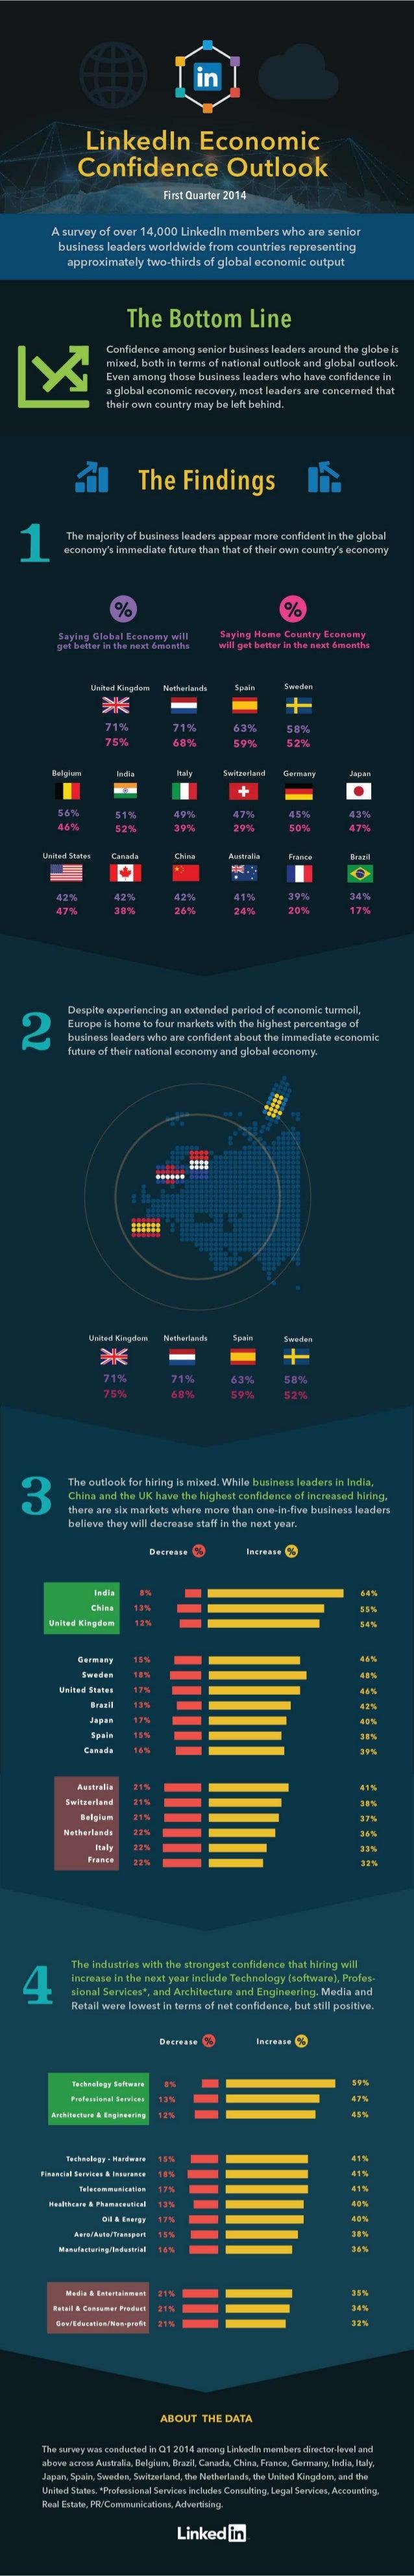 LinkedIn Economic Confidence Outlook Q1 2014